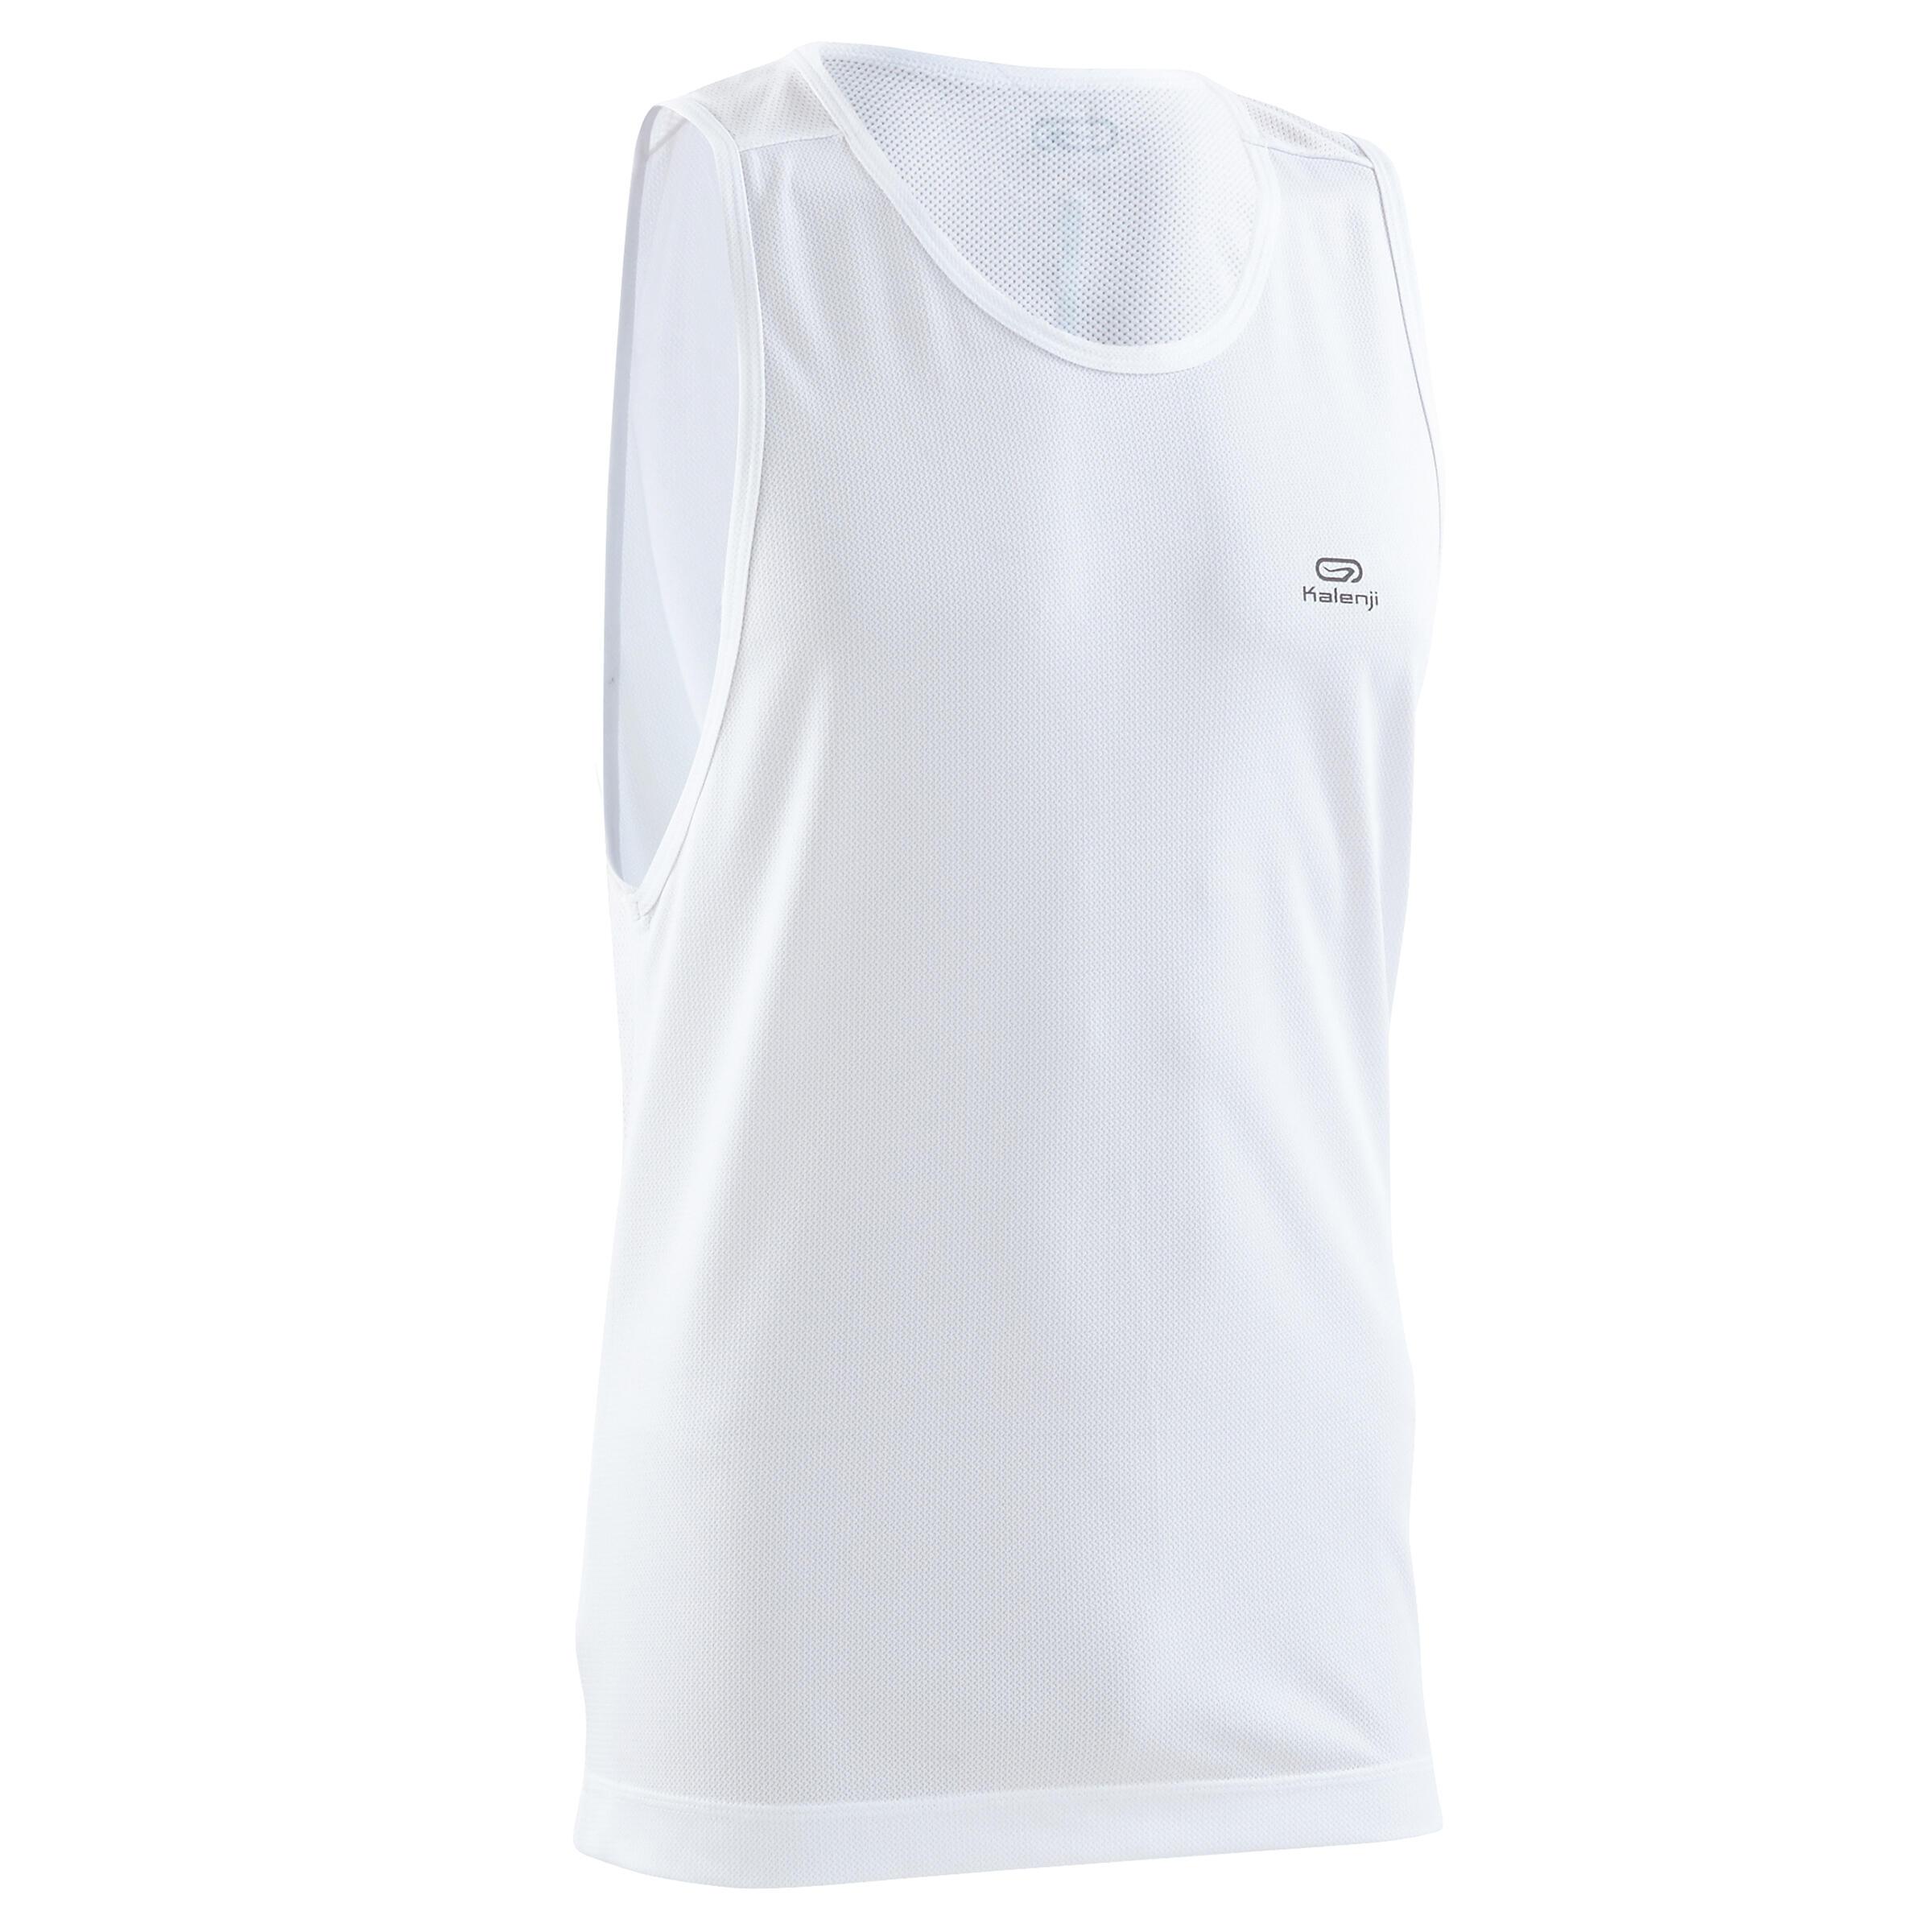 Laufshirt ärmellos Tank-Top Run Dry Herren | Sportbekleidung > Sportshirts > Laufshirts | Kalenji